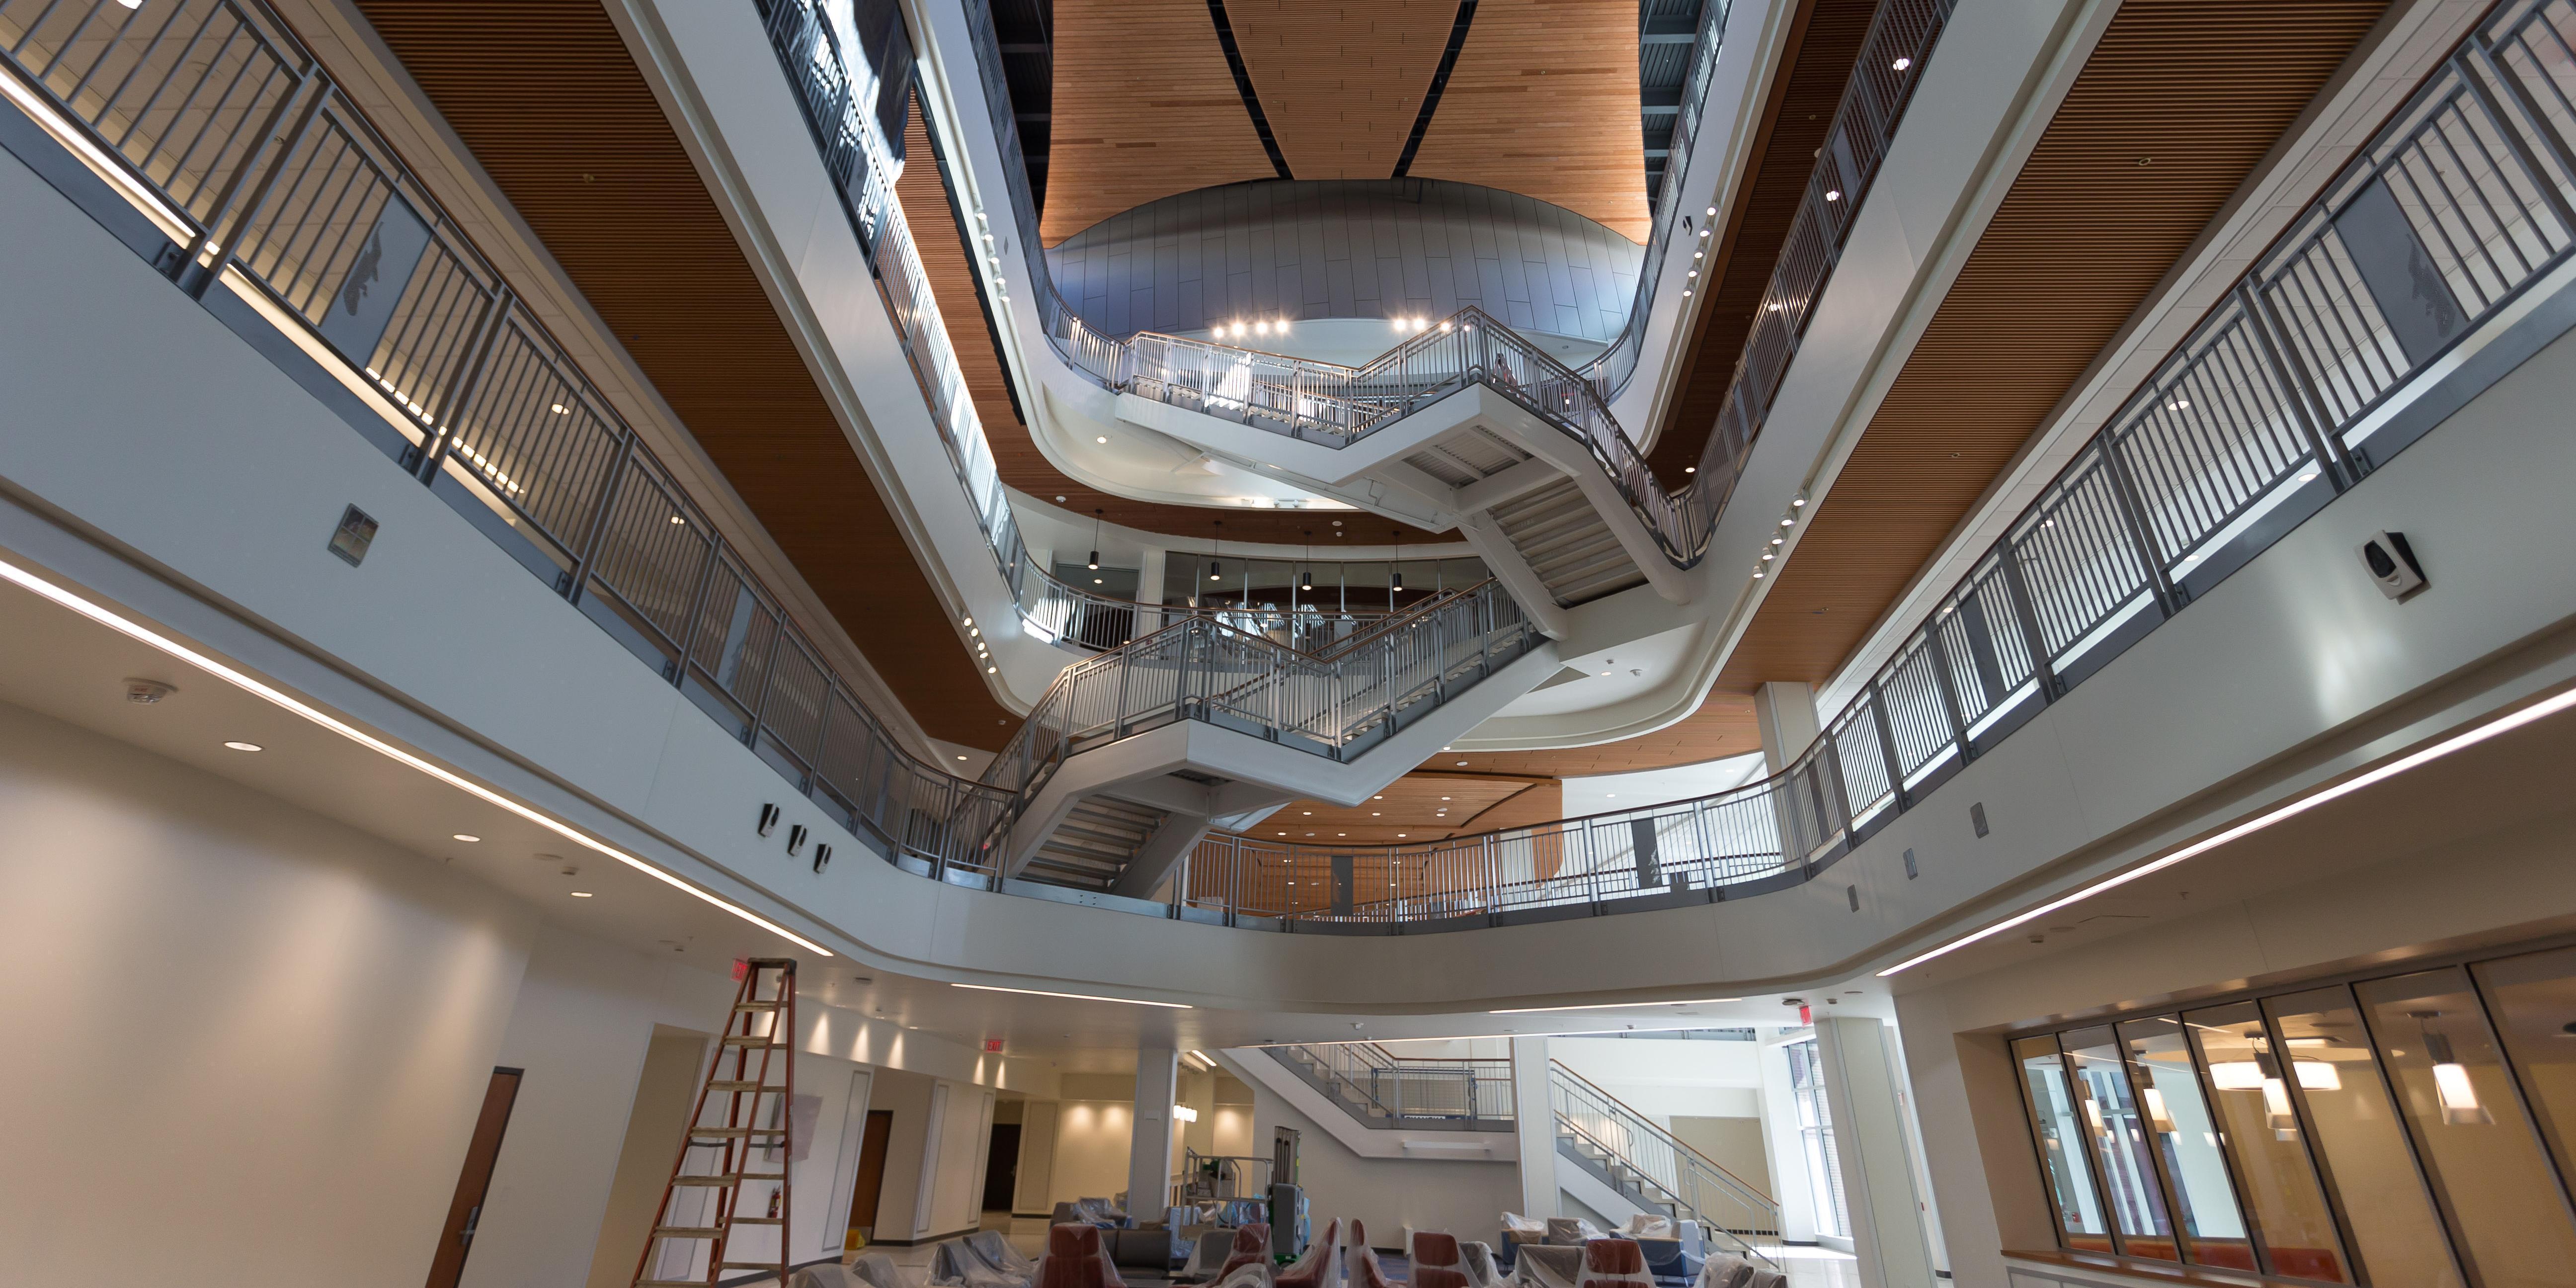 Reitz Union inside Stairs